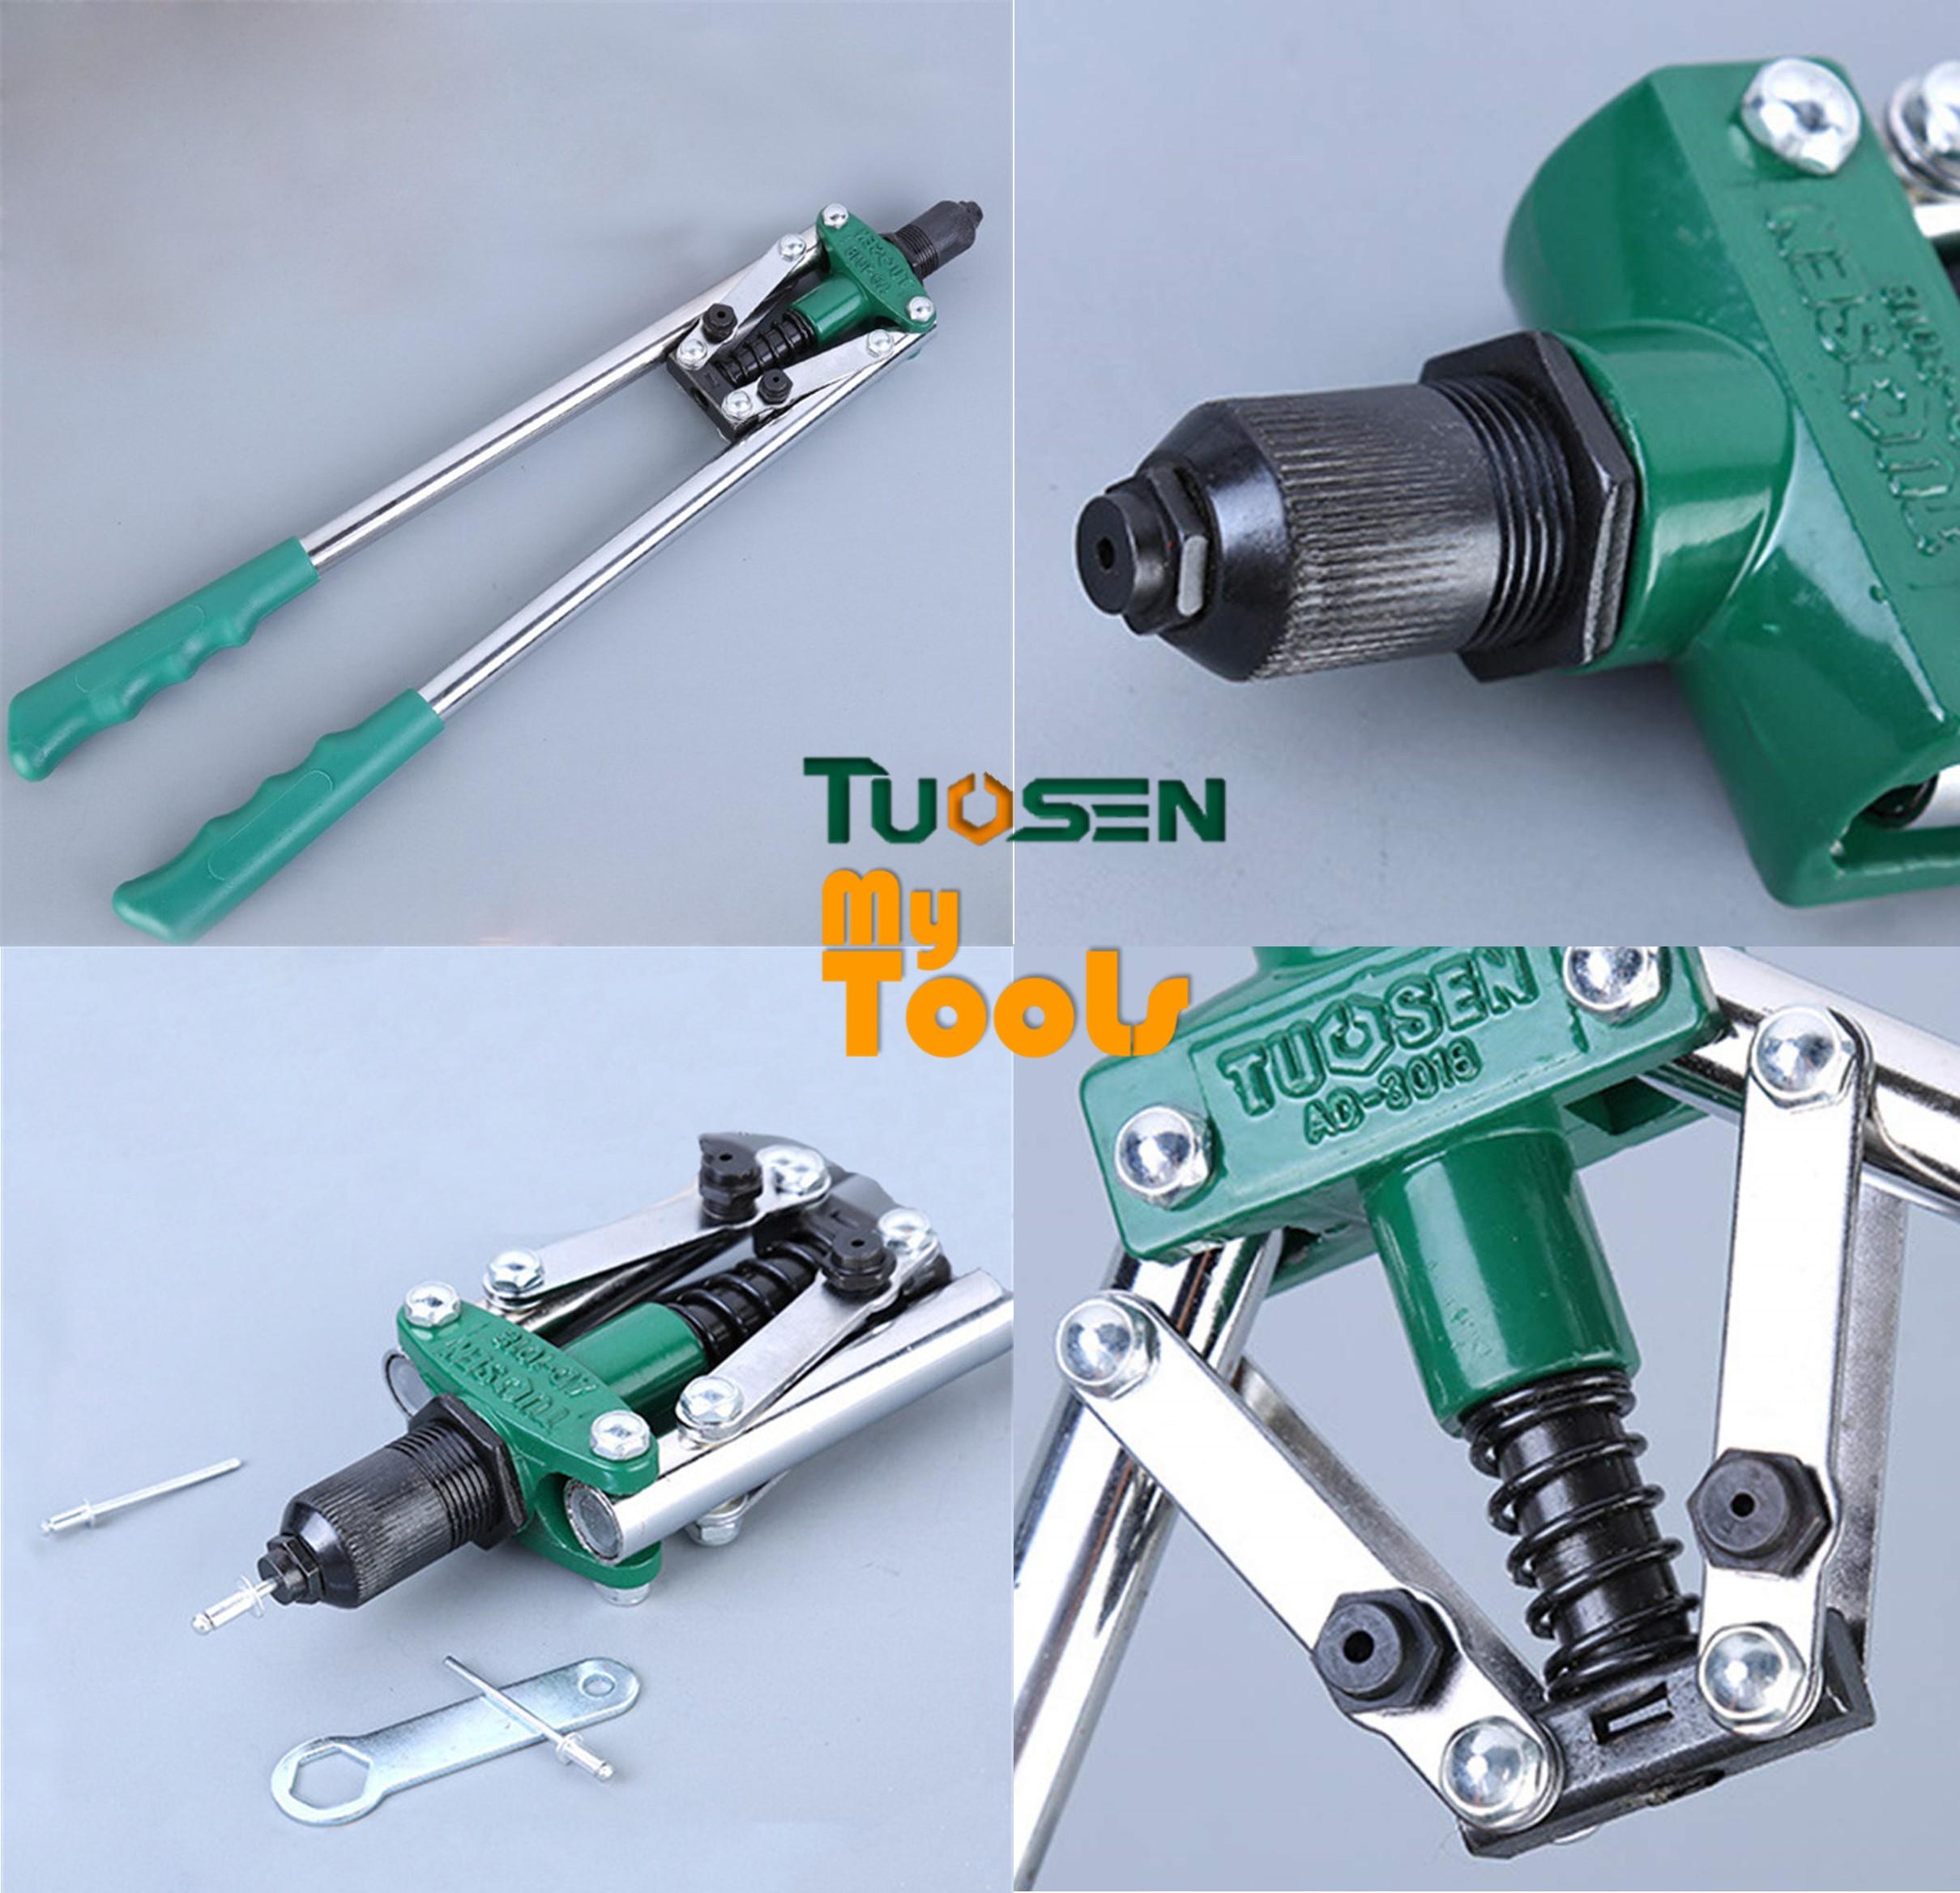 "Mytools Premium TUOSEN 17"" Heavy Duty Manual Hand Riveter Gun Rivet Double Handles Nail Gun Screwdriver Tool"